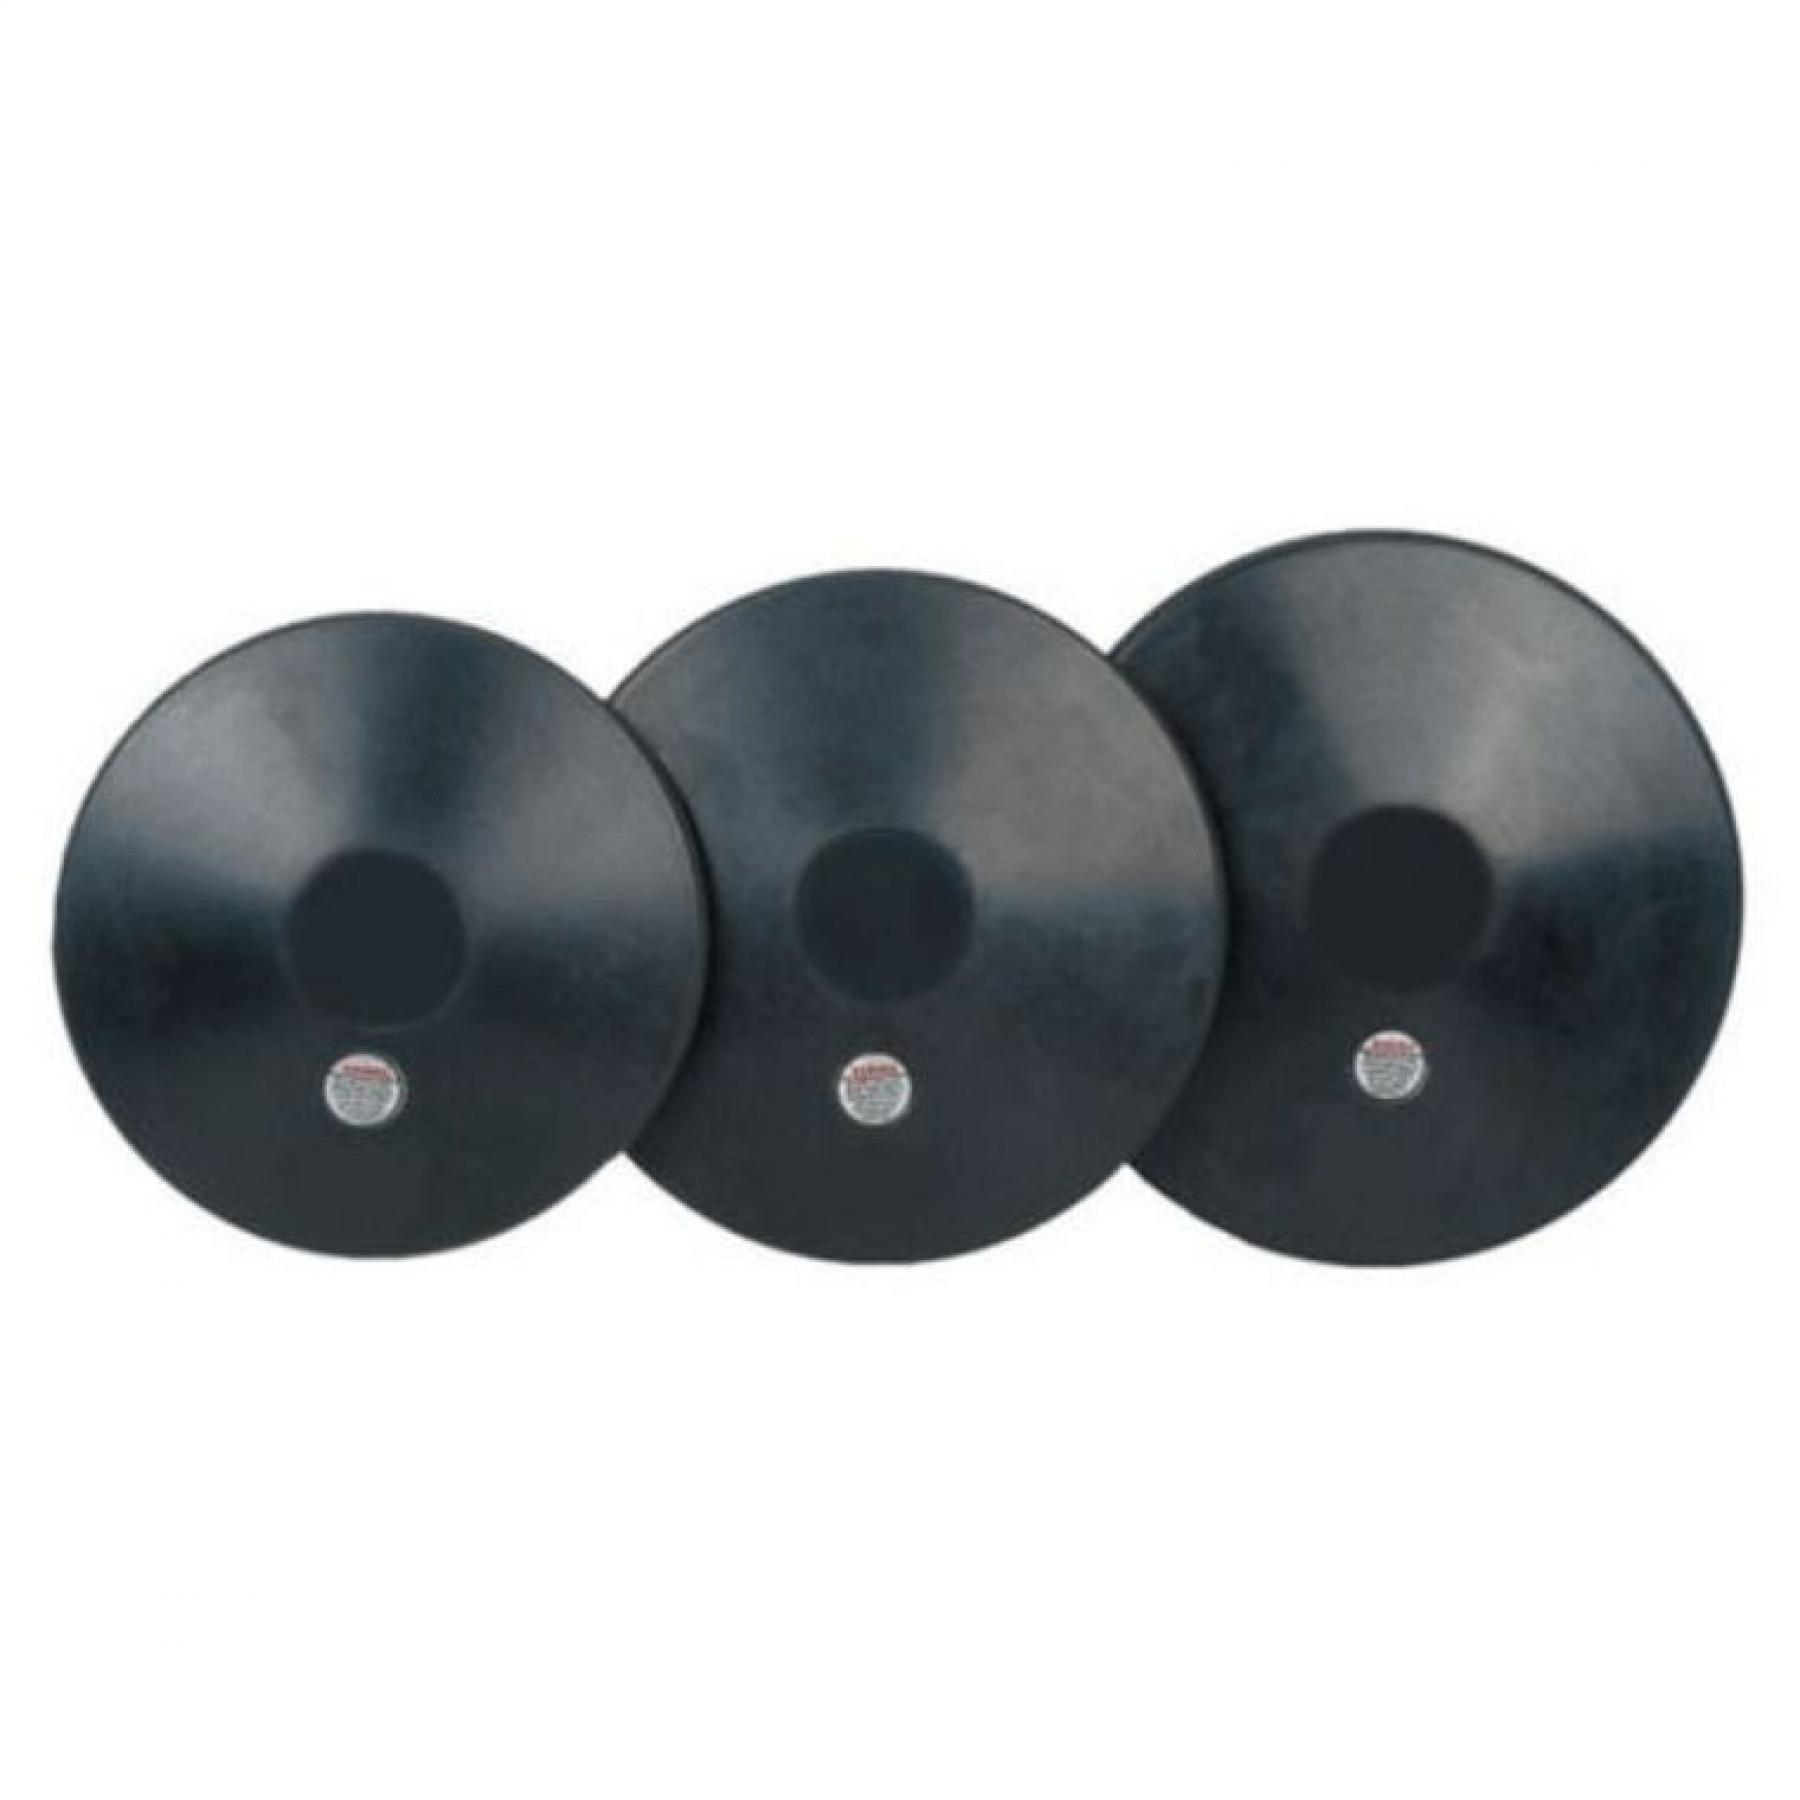 Discus Rubber 1.75kg